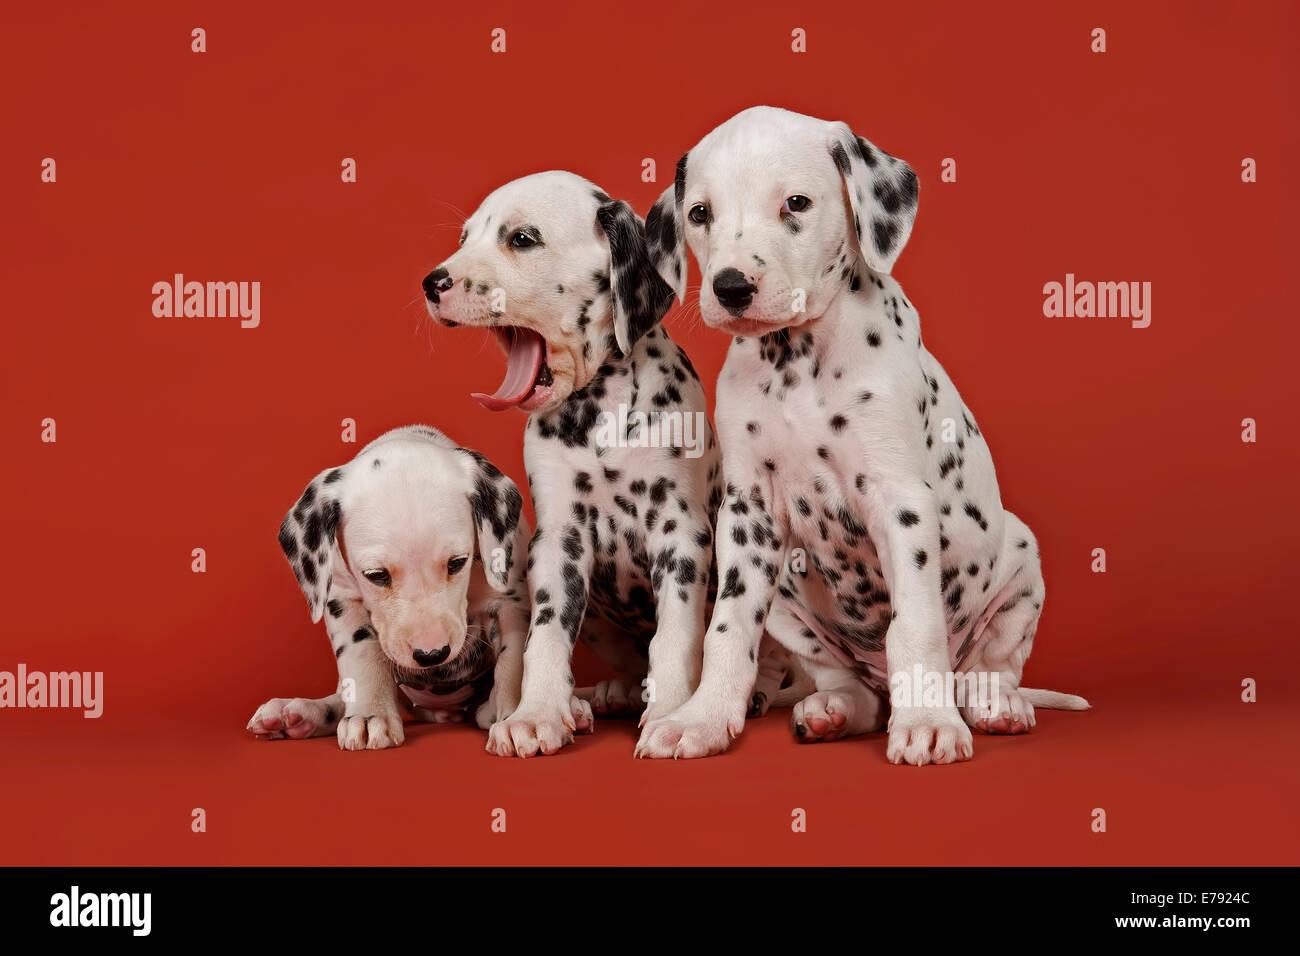 Three Dalmatian puppies, 6 weeks - Stock Image